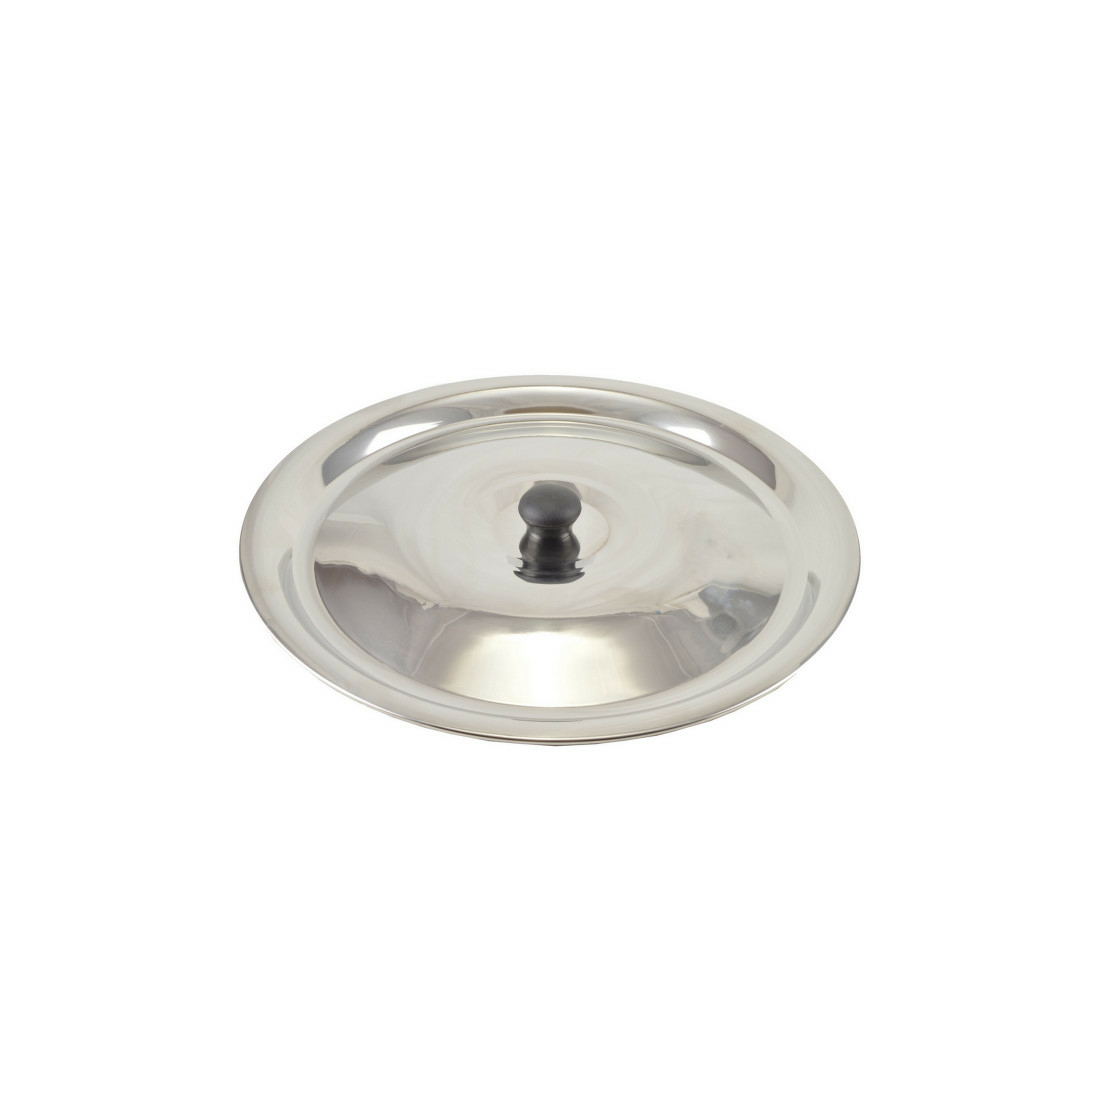 Bográcsfedő inox 20-25 liter